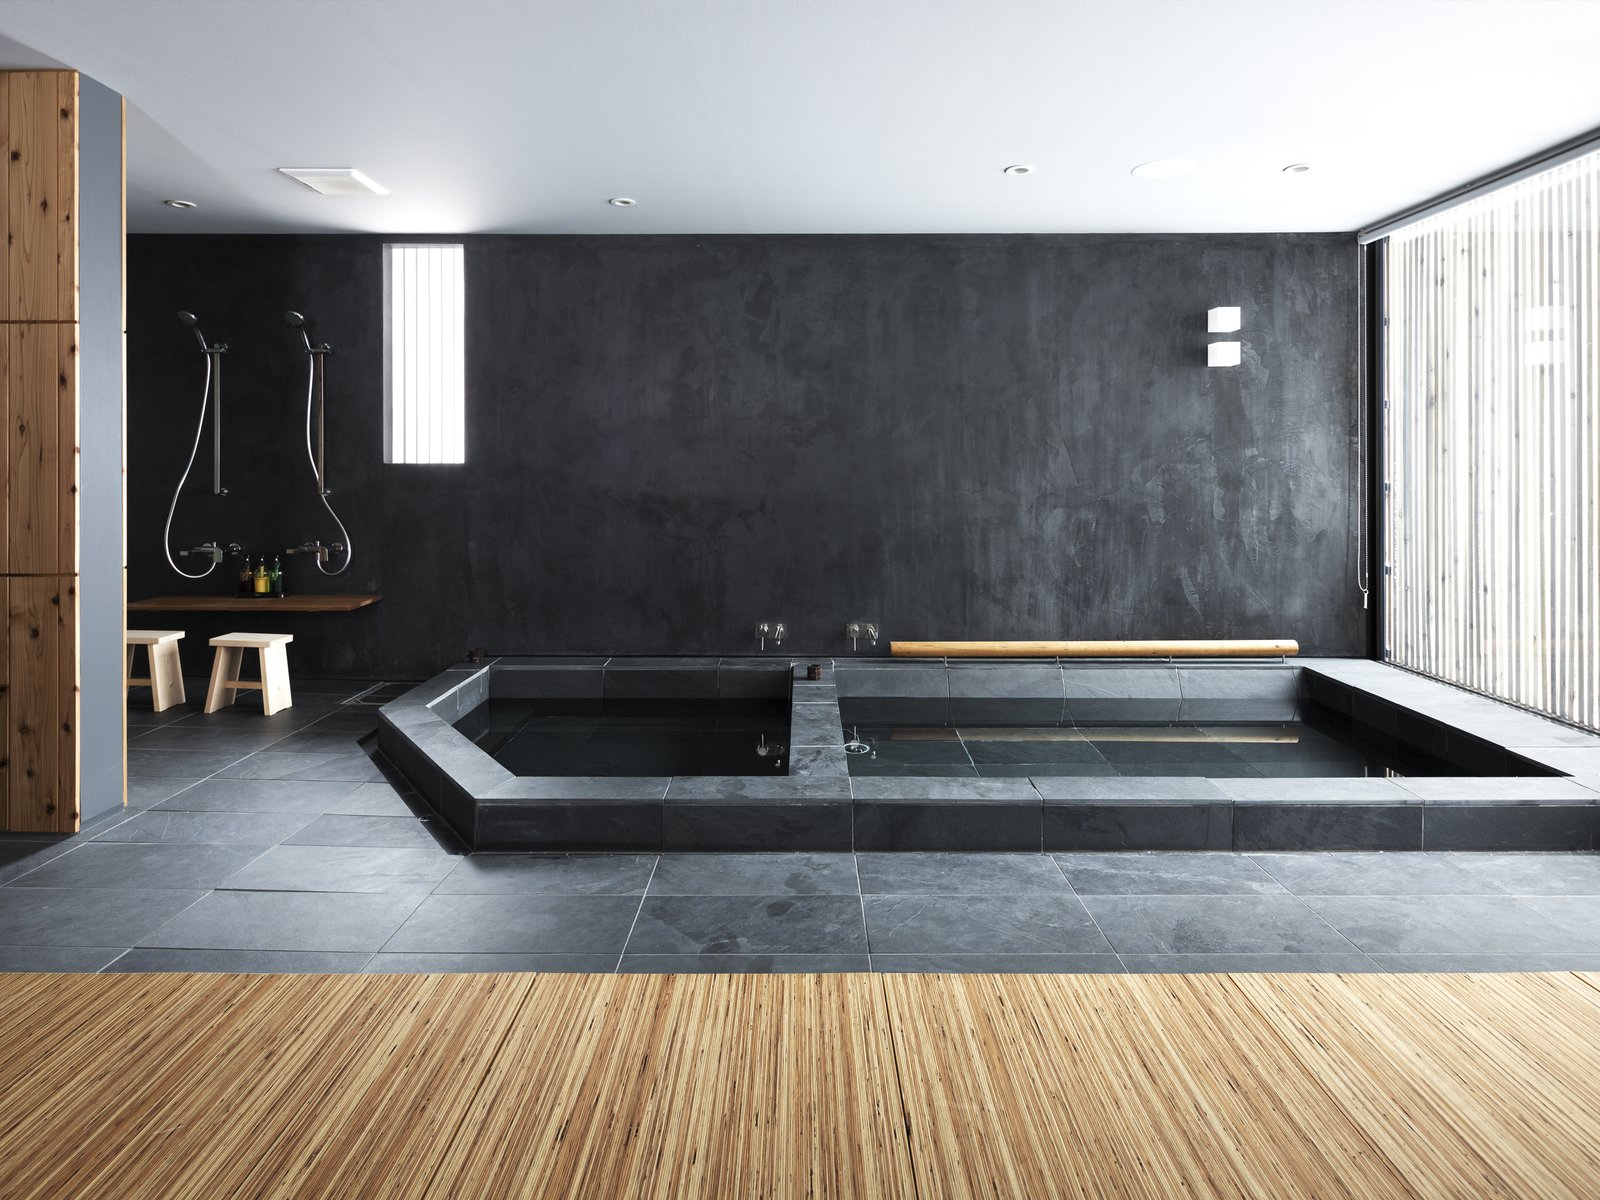 Strata House bathtub